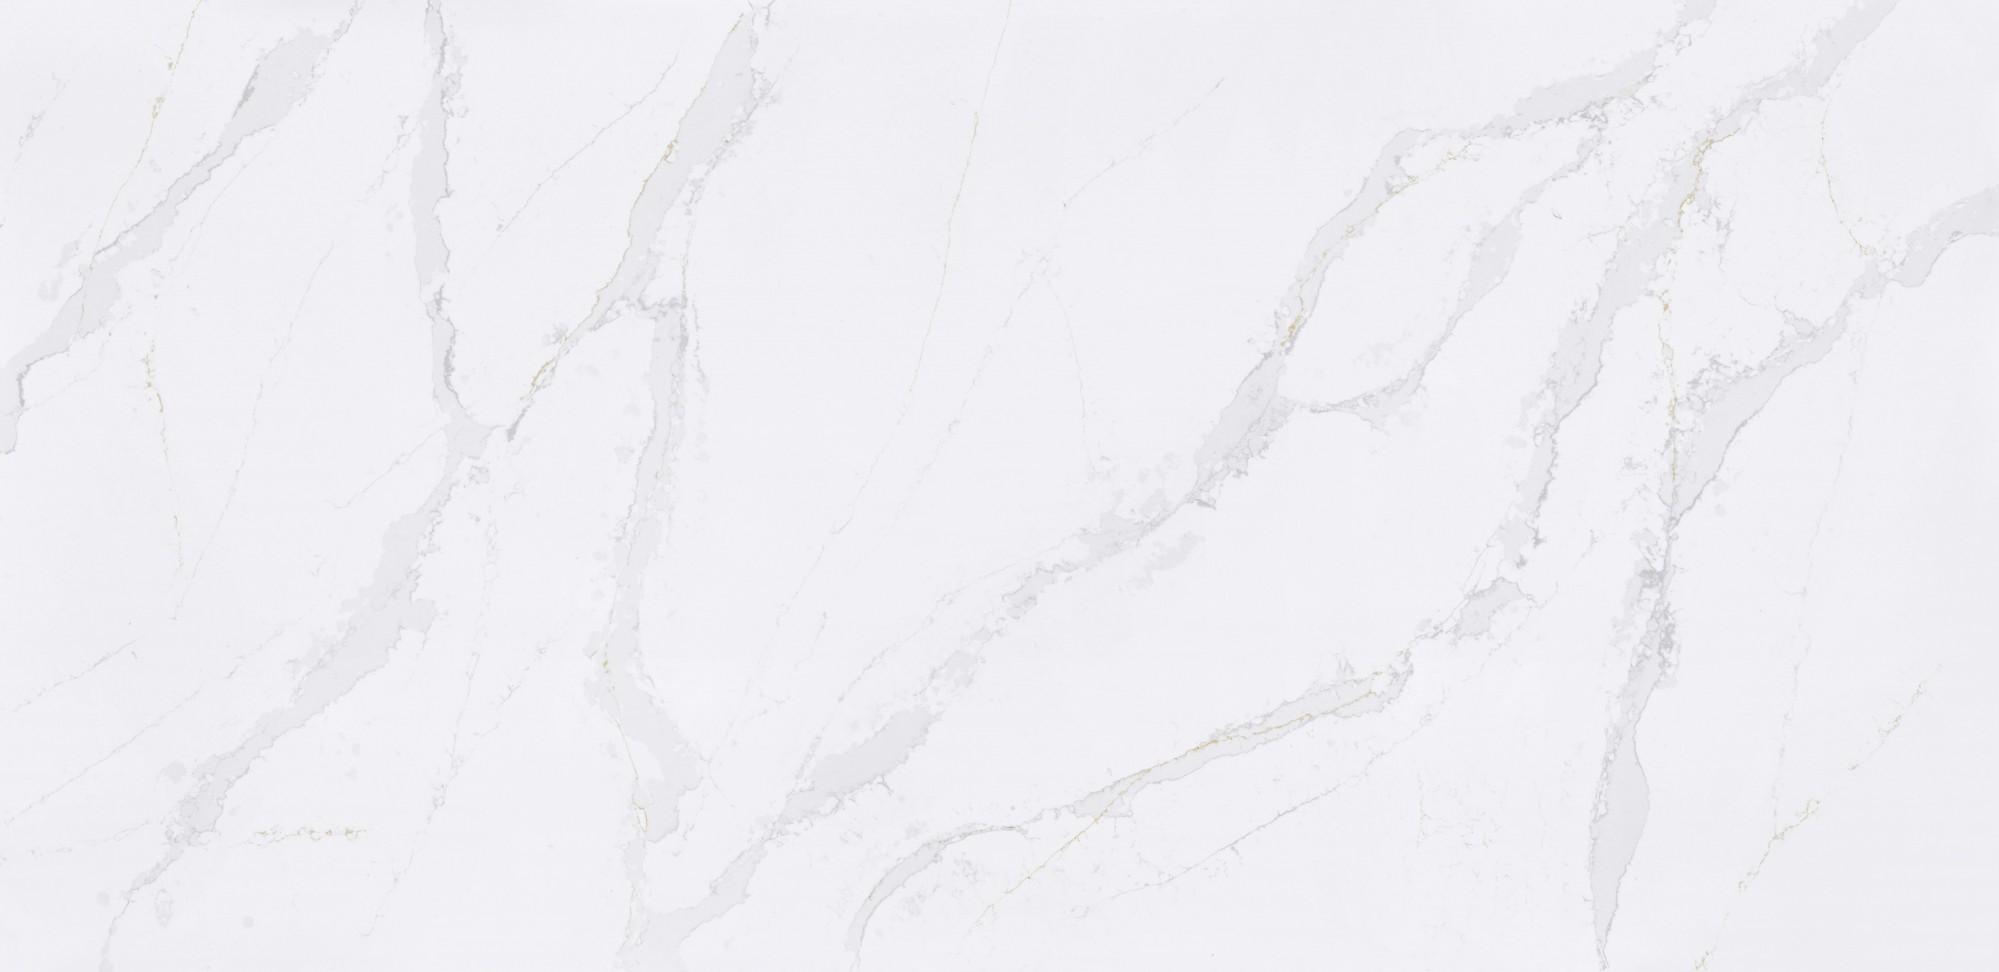 quartz silestone blanc avec veinage pour cuisine 33 40